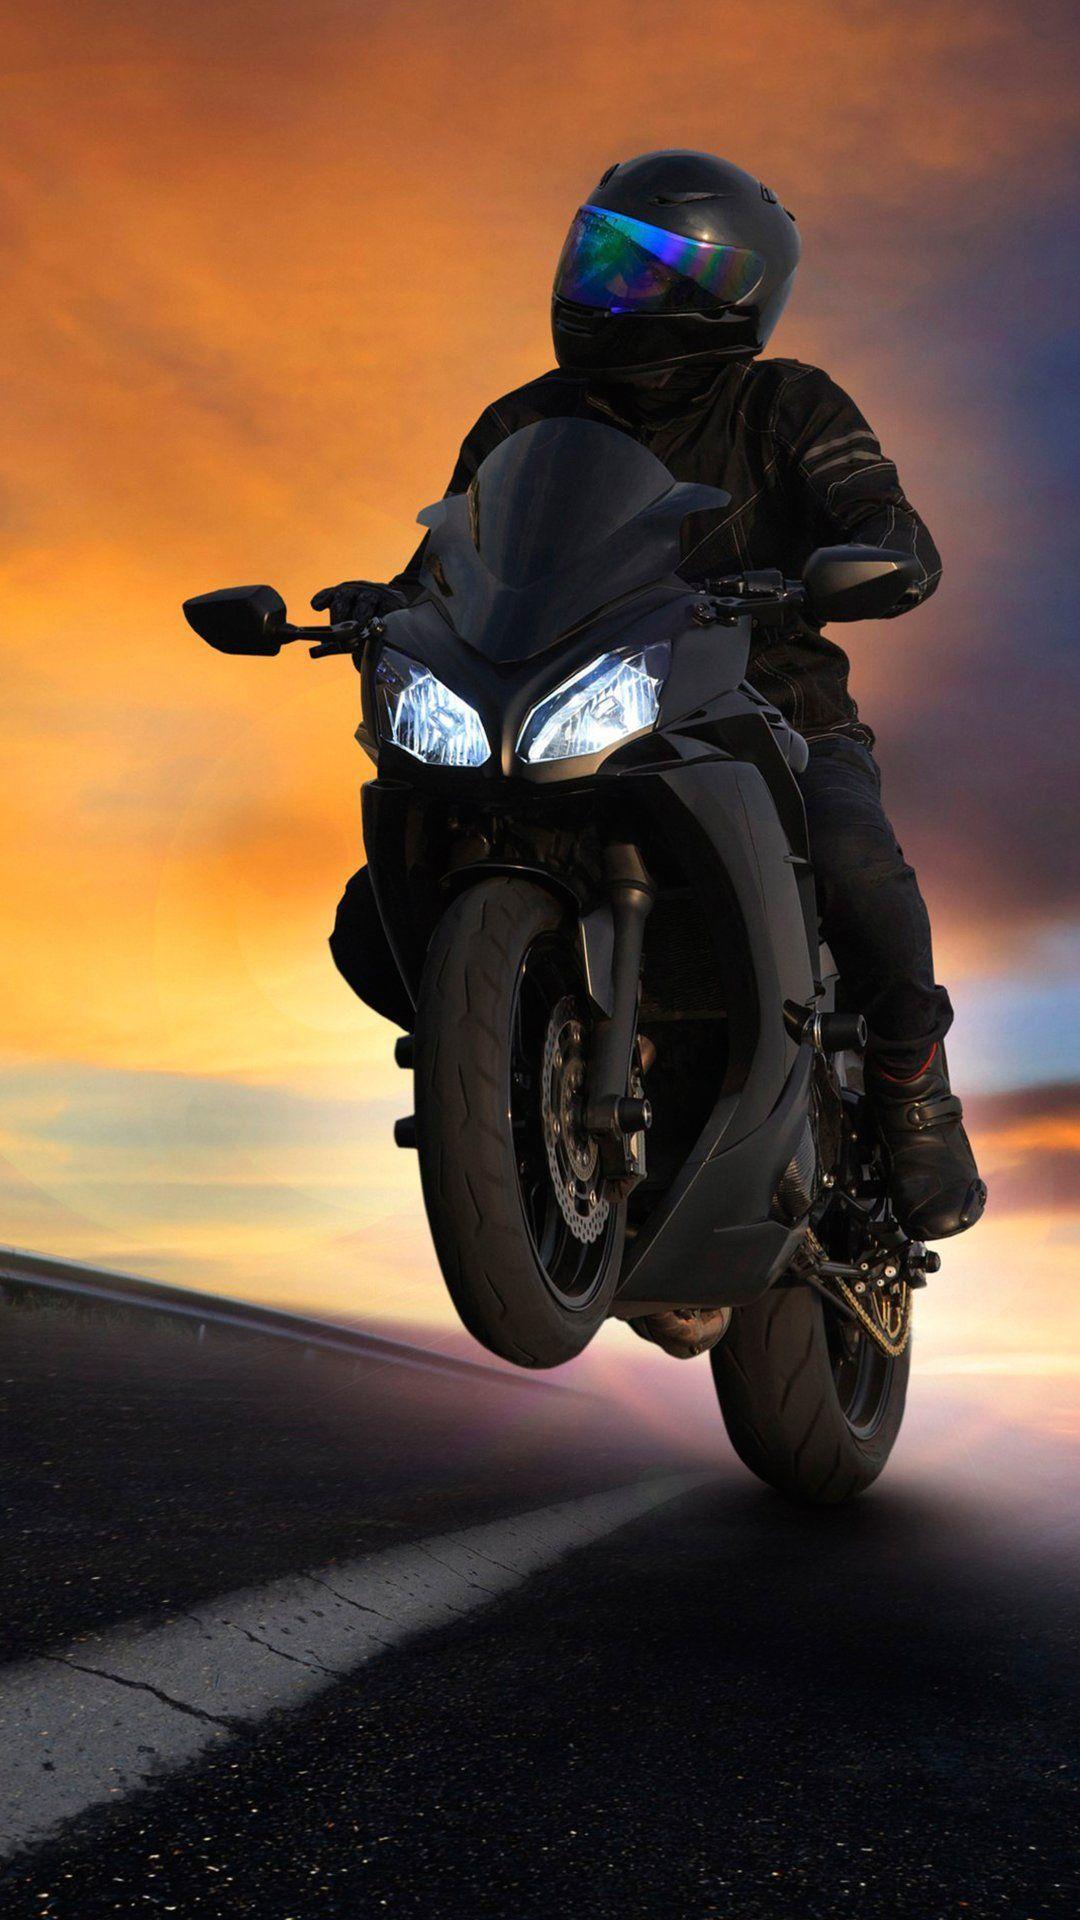 Black Wallpaper Iphone Motorcycle Wallpaper Black Wallpaper Iphone Super Bikes